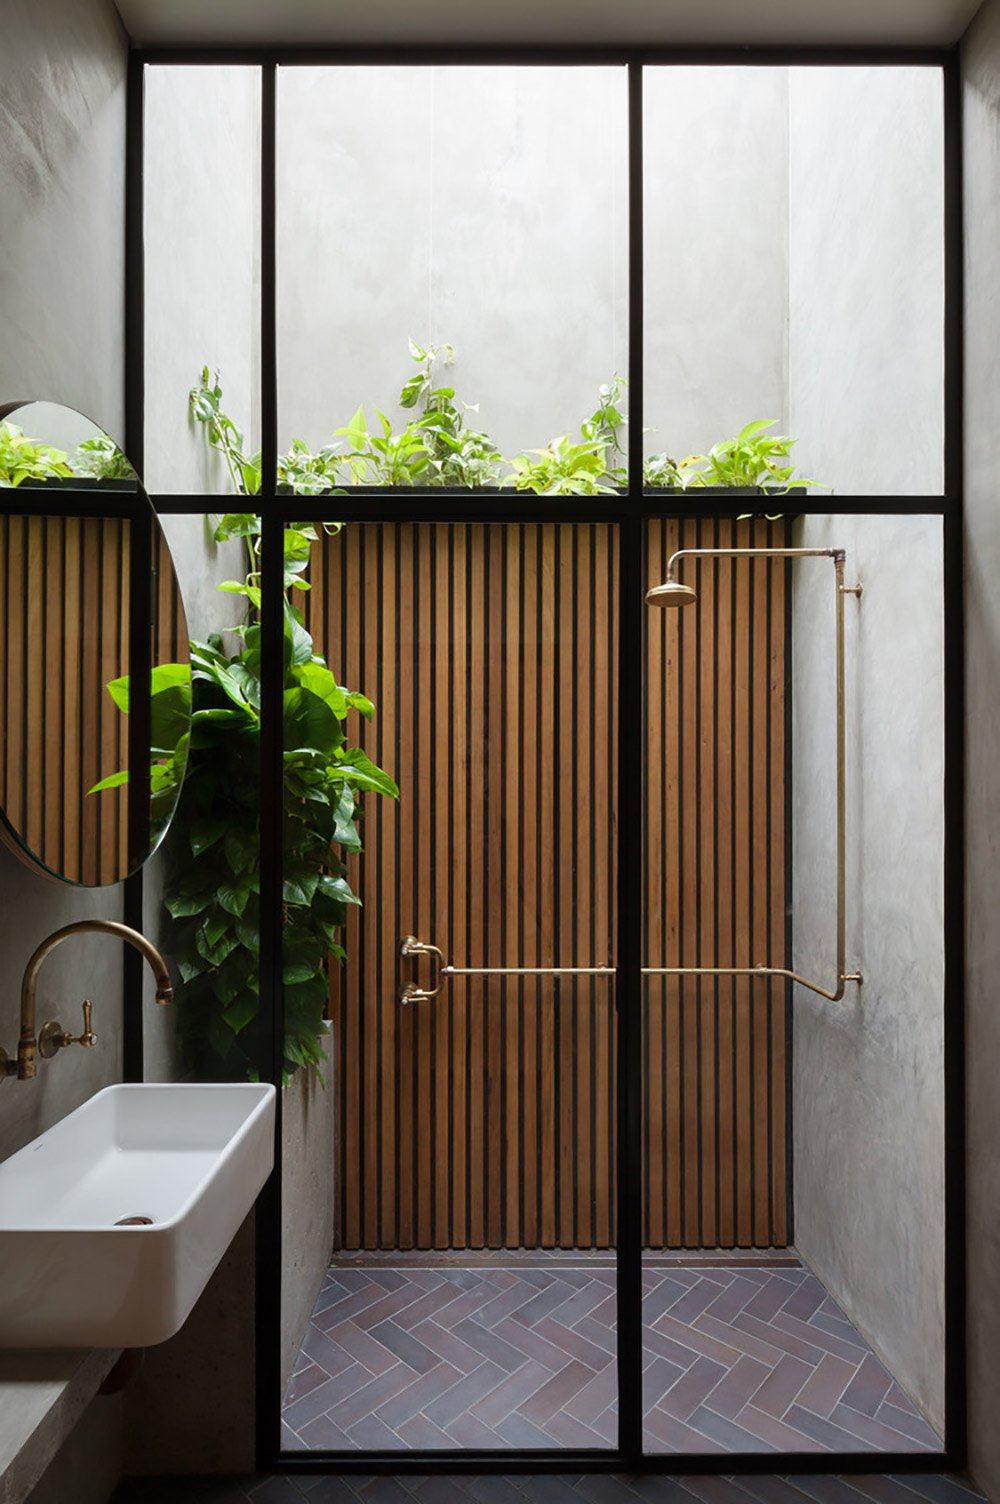 double-life-house-breathe-architecture-3